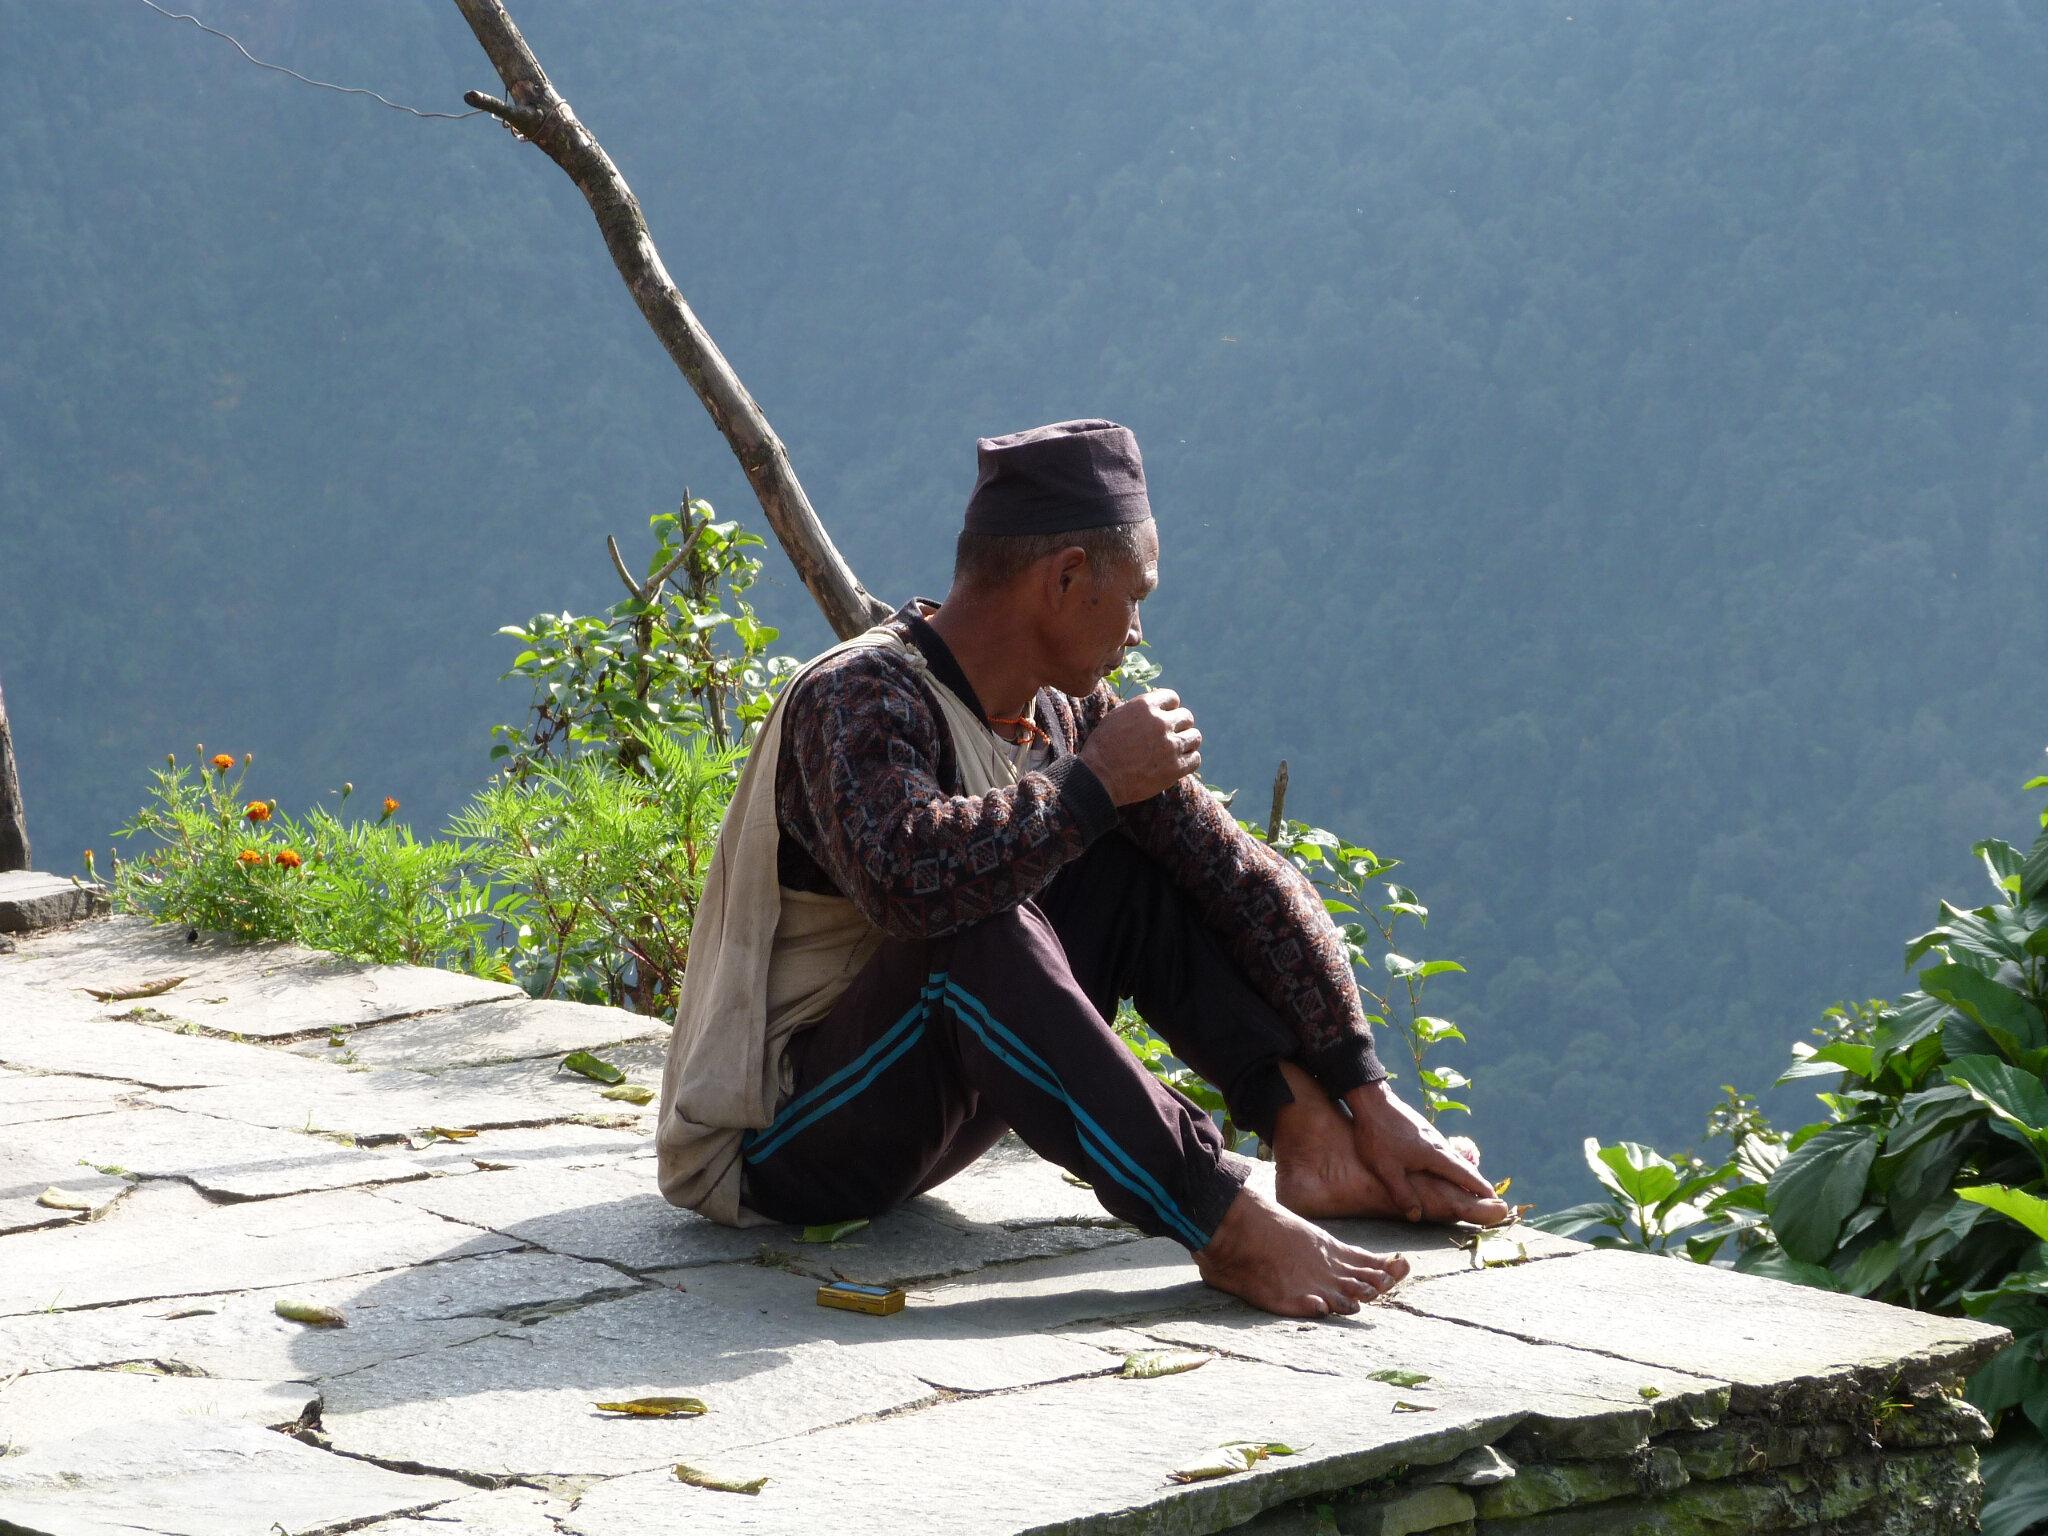 Flash infos n°21 : France 5 mercredi 1er avril à 2h30 du matin - Manaslu, royaume fragile de l'Himalaya